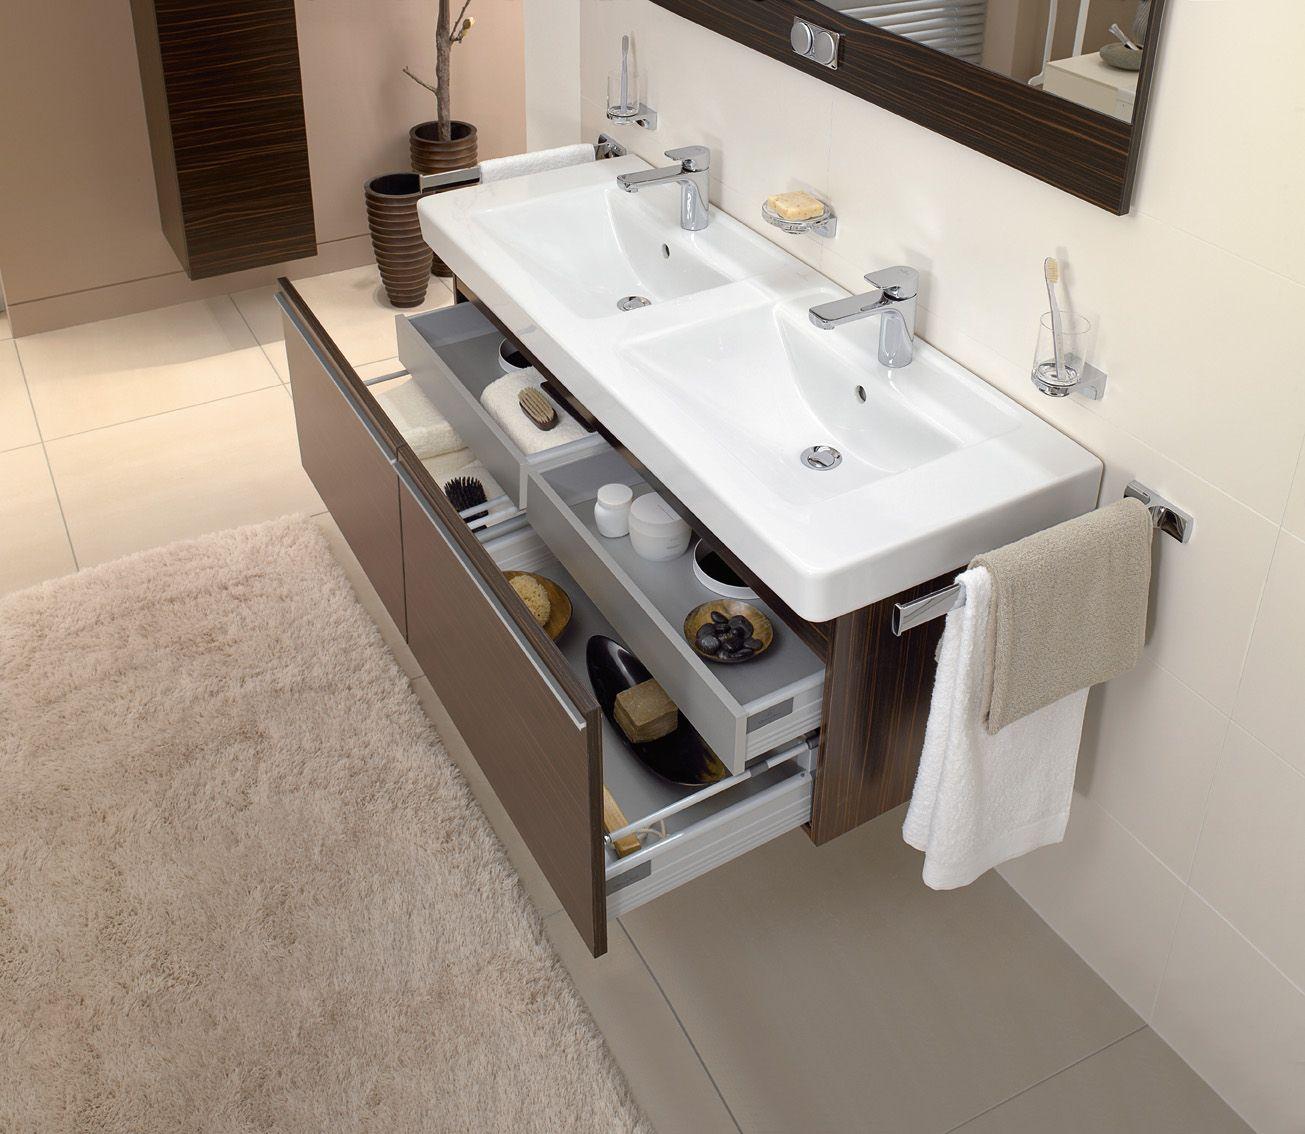 Mueble Central Line Casita Pinterest Bathroom cabinets Kid